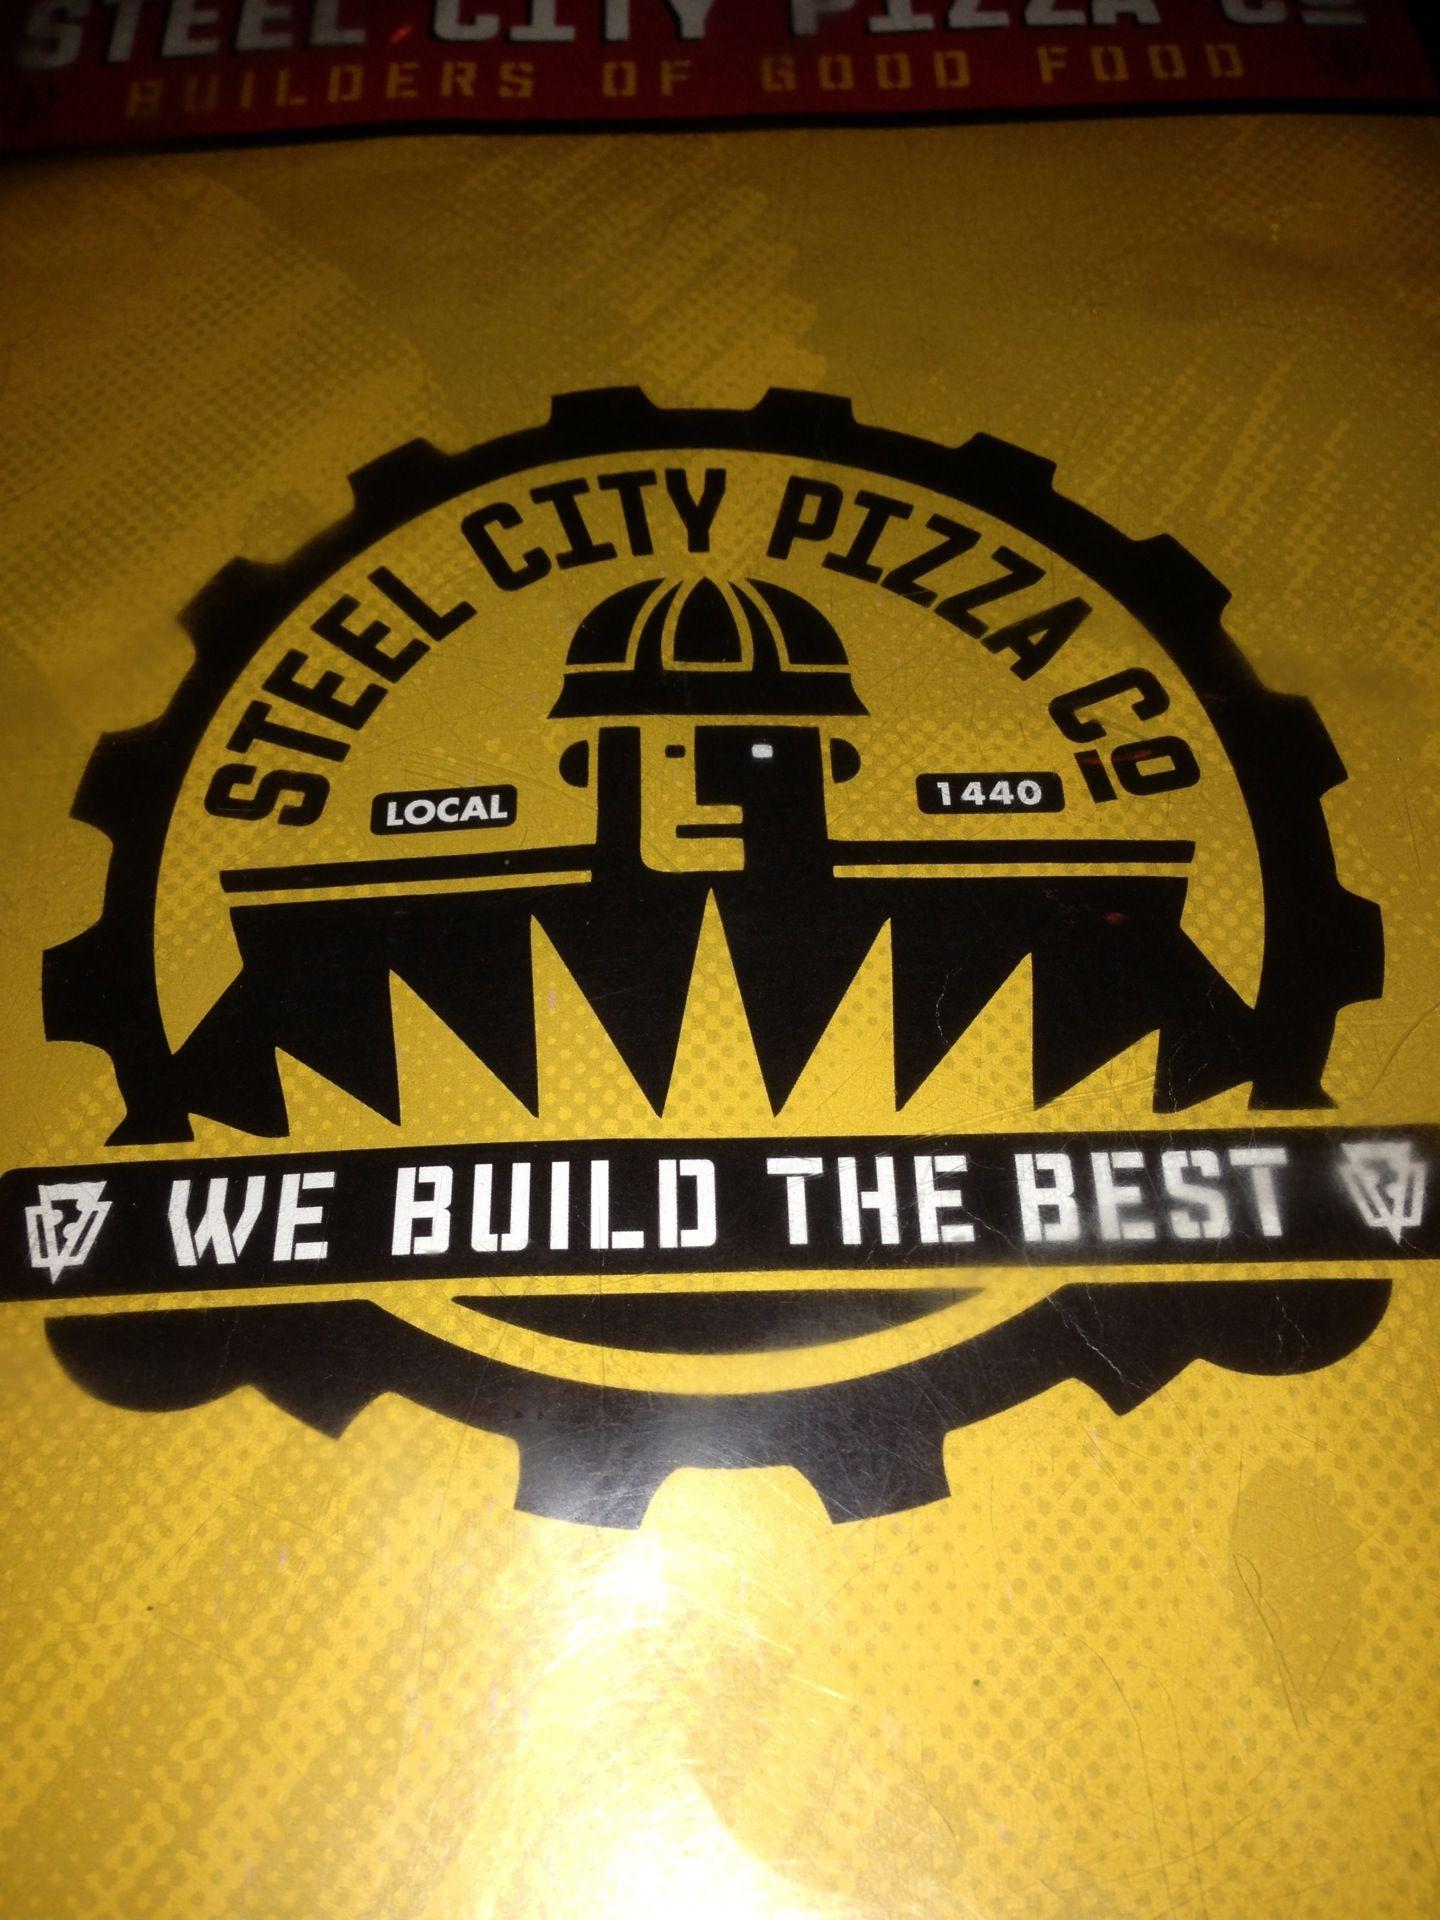 Steel City Pizza Company Pizza Company Local Bars Pizza